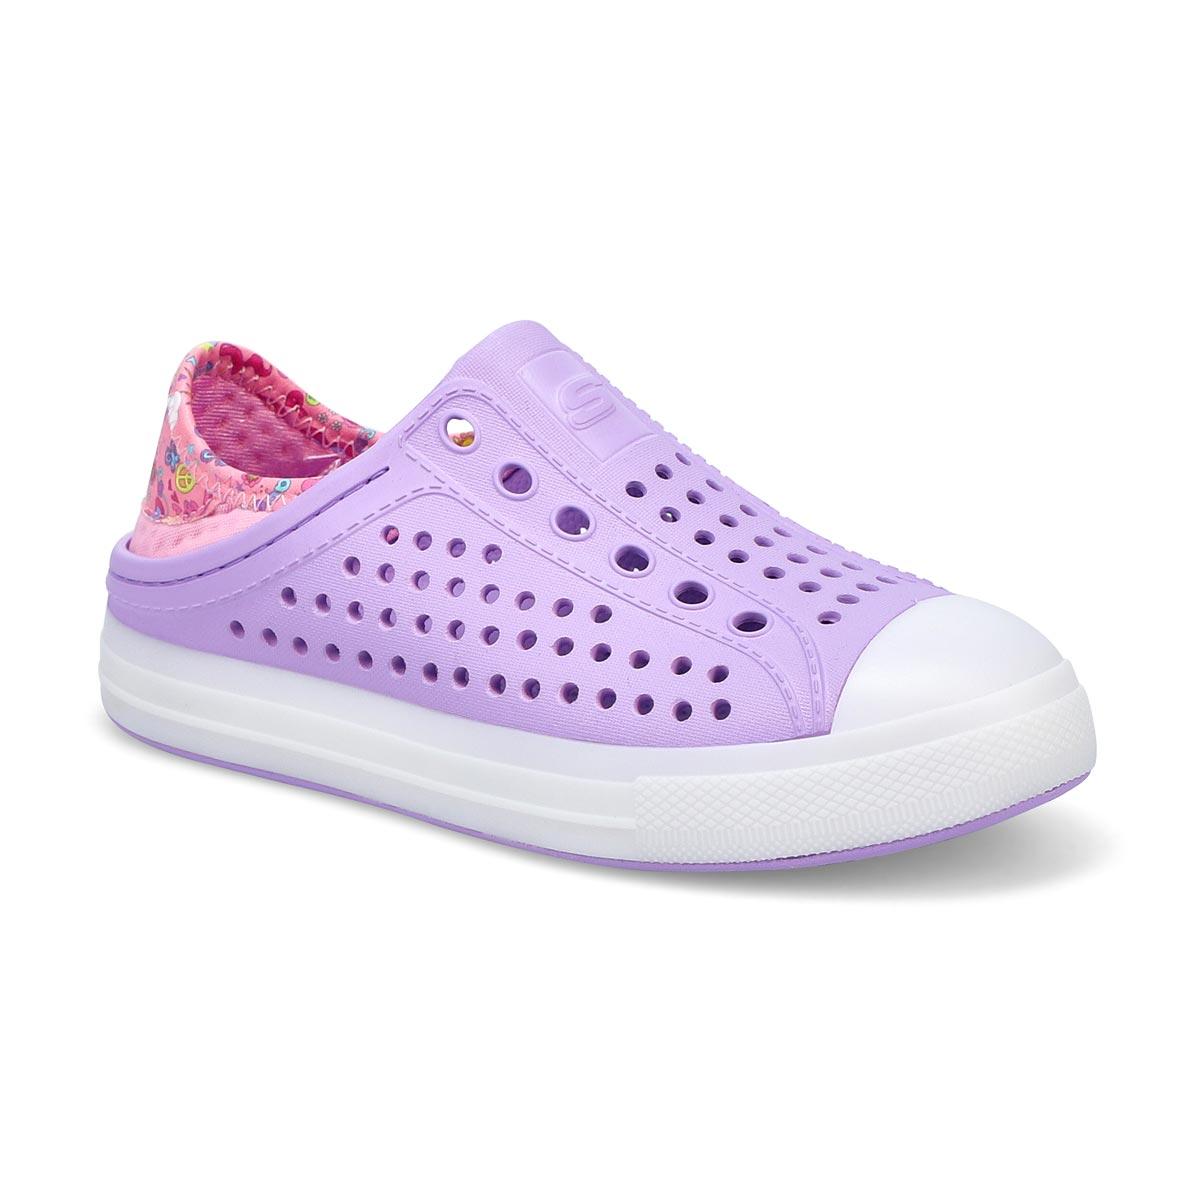 Girls' Guzman Flash Shoe - Lavender/Pink